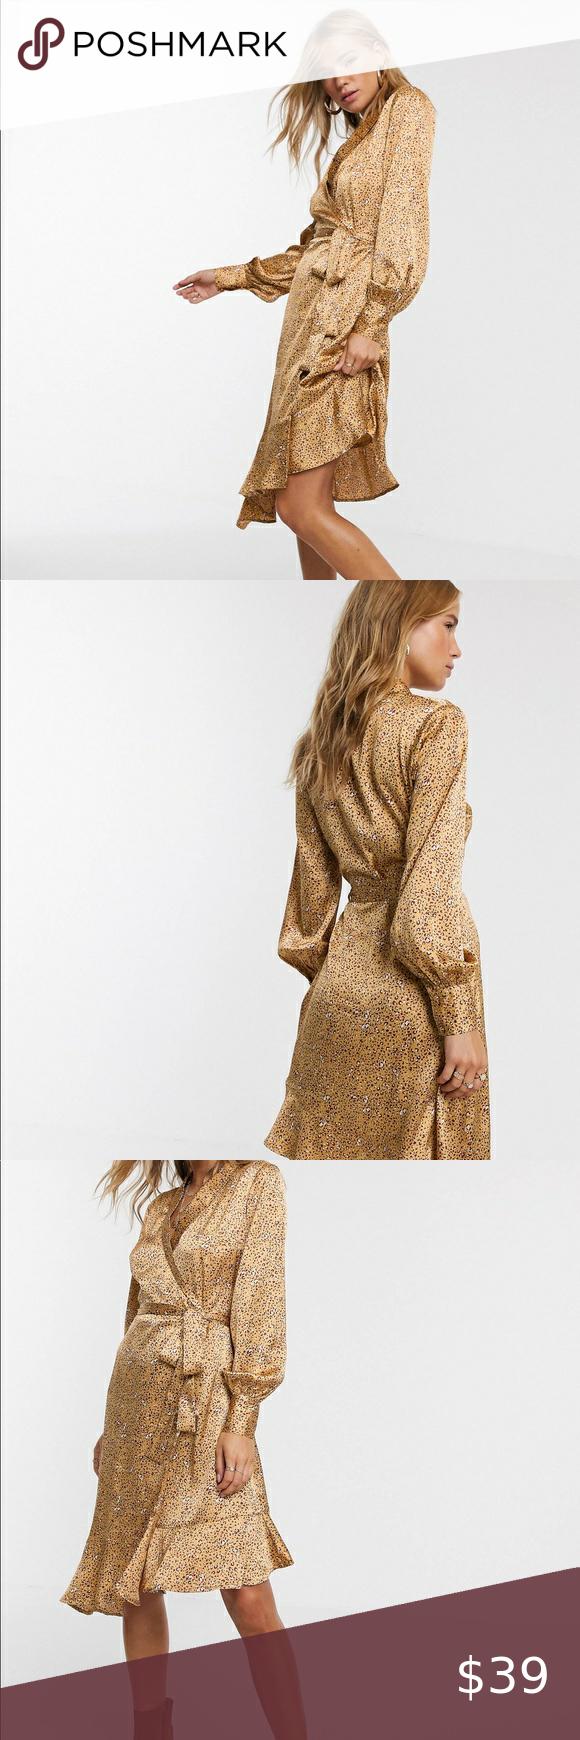 19+ Asos leopard print wrap dress trends